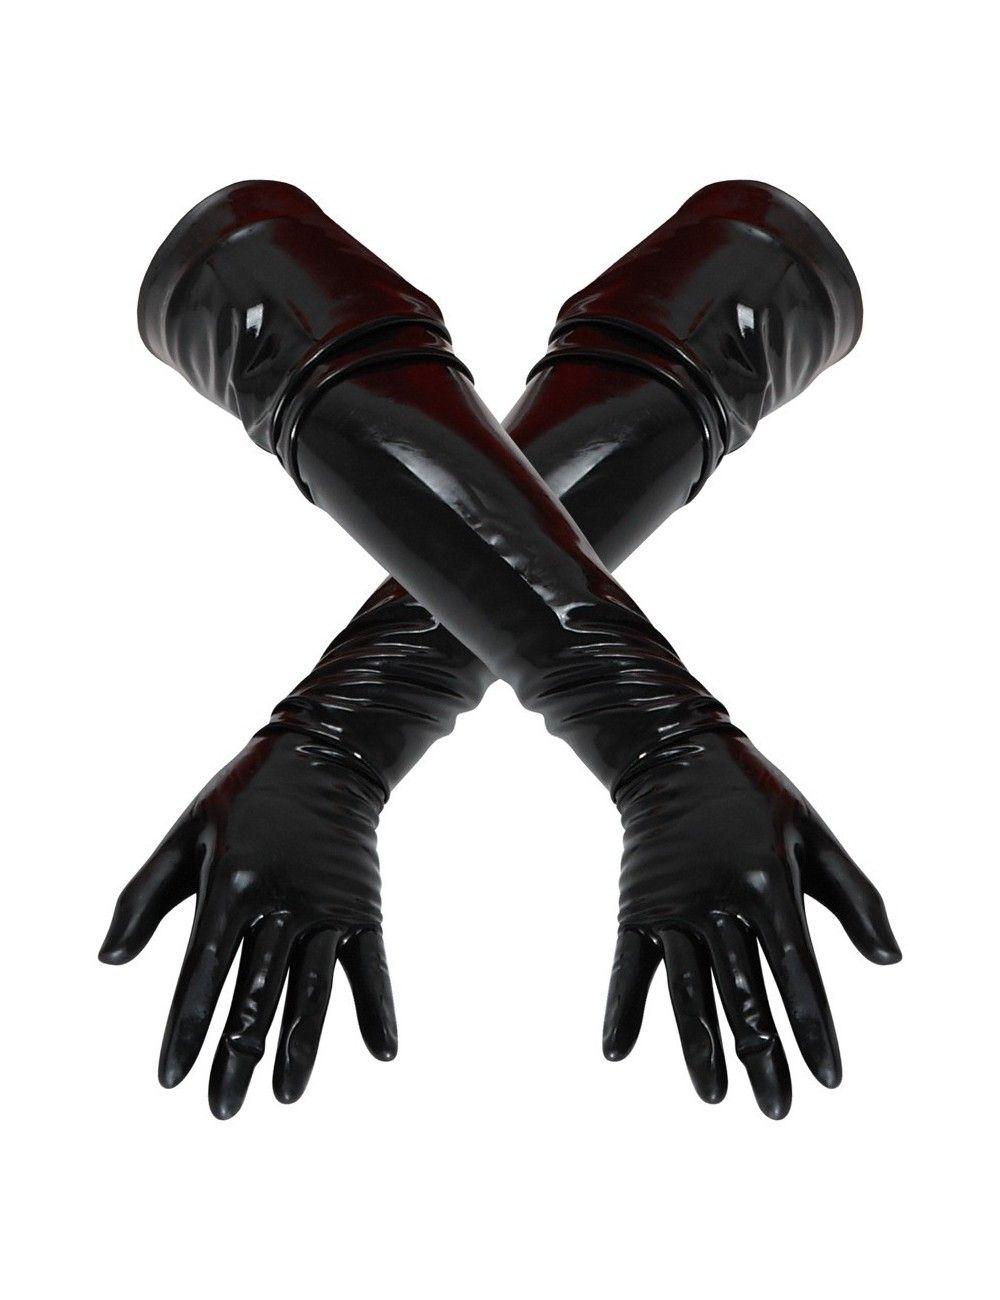 Gants Longs en Latex Noir Latex Collection